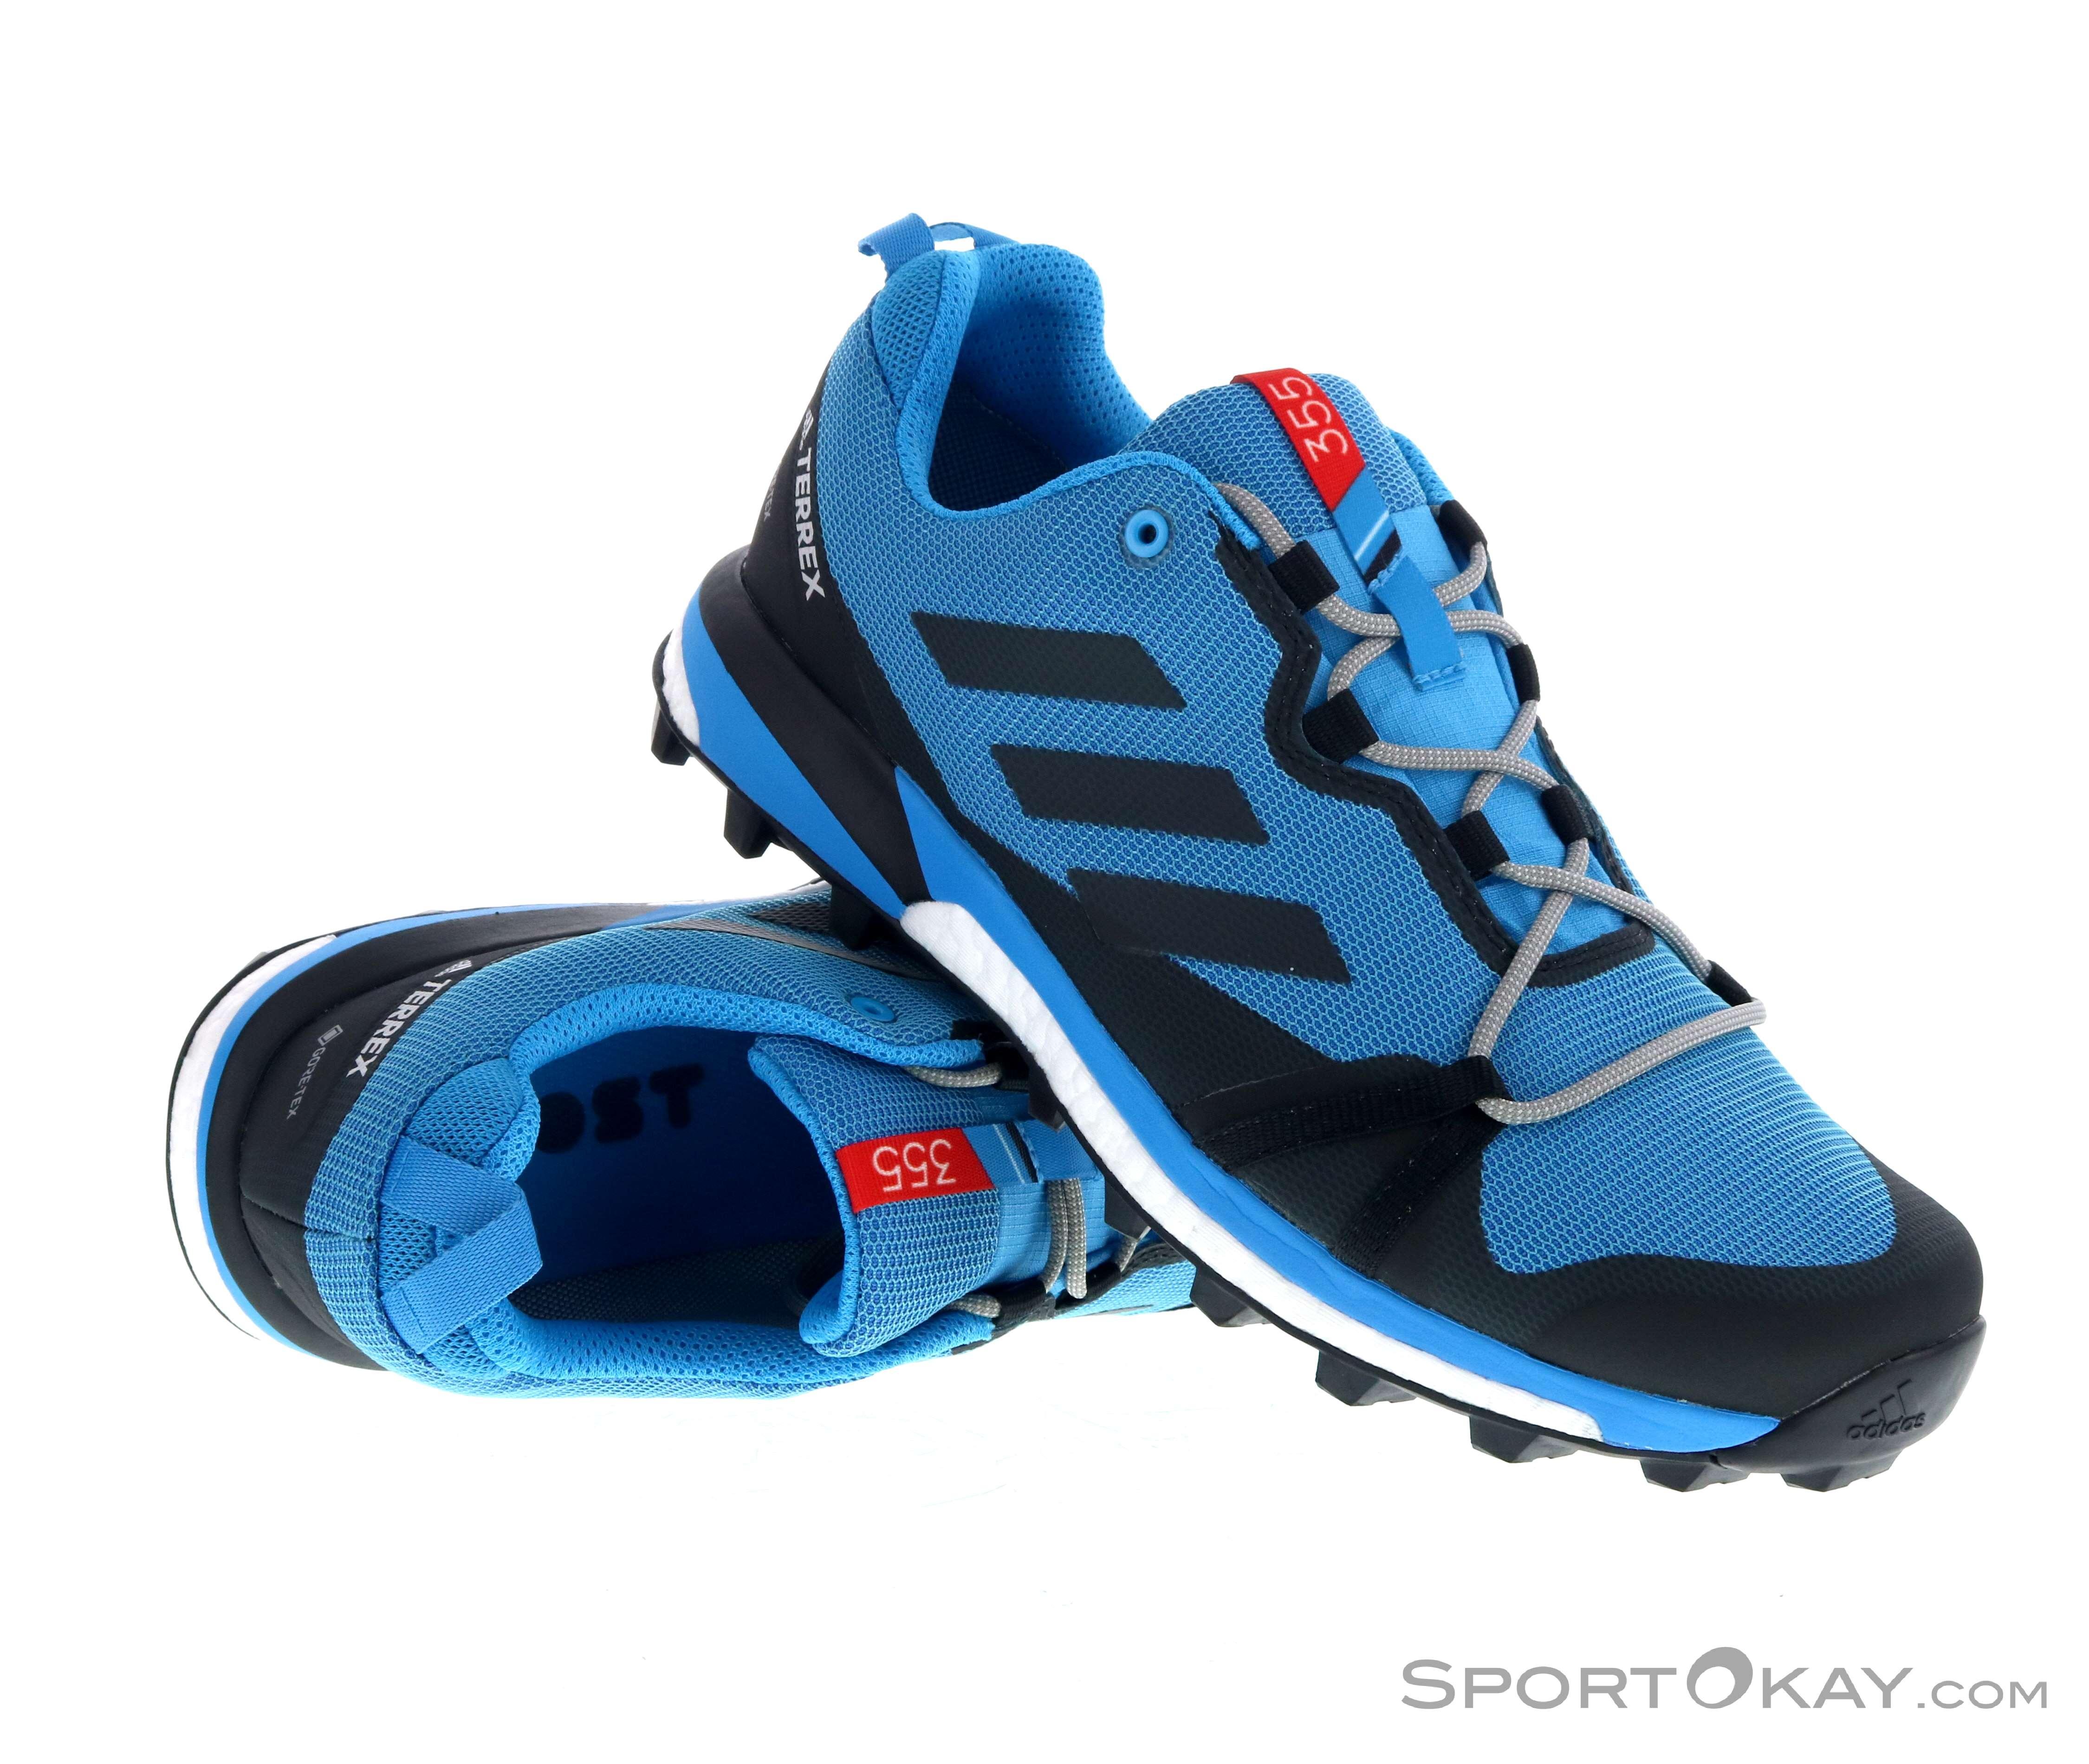 e2f057b98021fc adidas Terrex Skychaser LT Mens Trekking Shoes Gore-Tex - Trekking ...